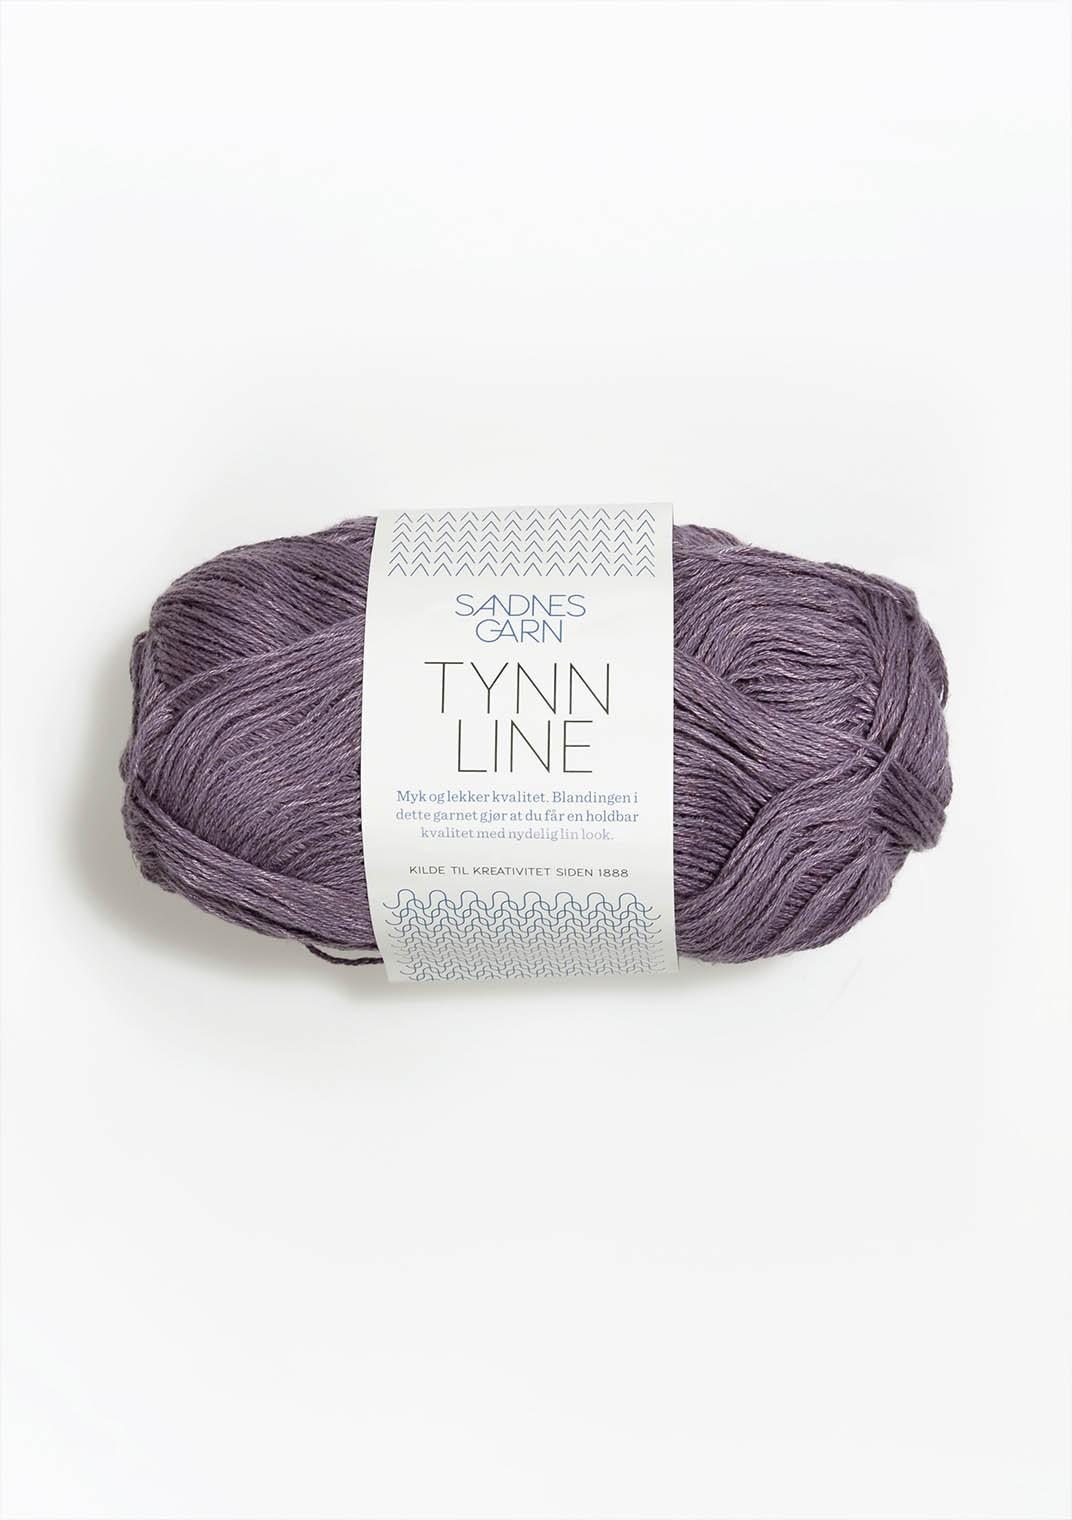 Sandnes tynn line 5052 lila